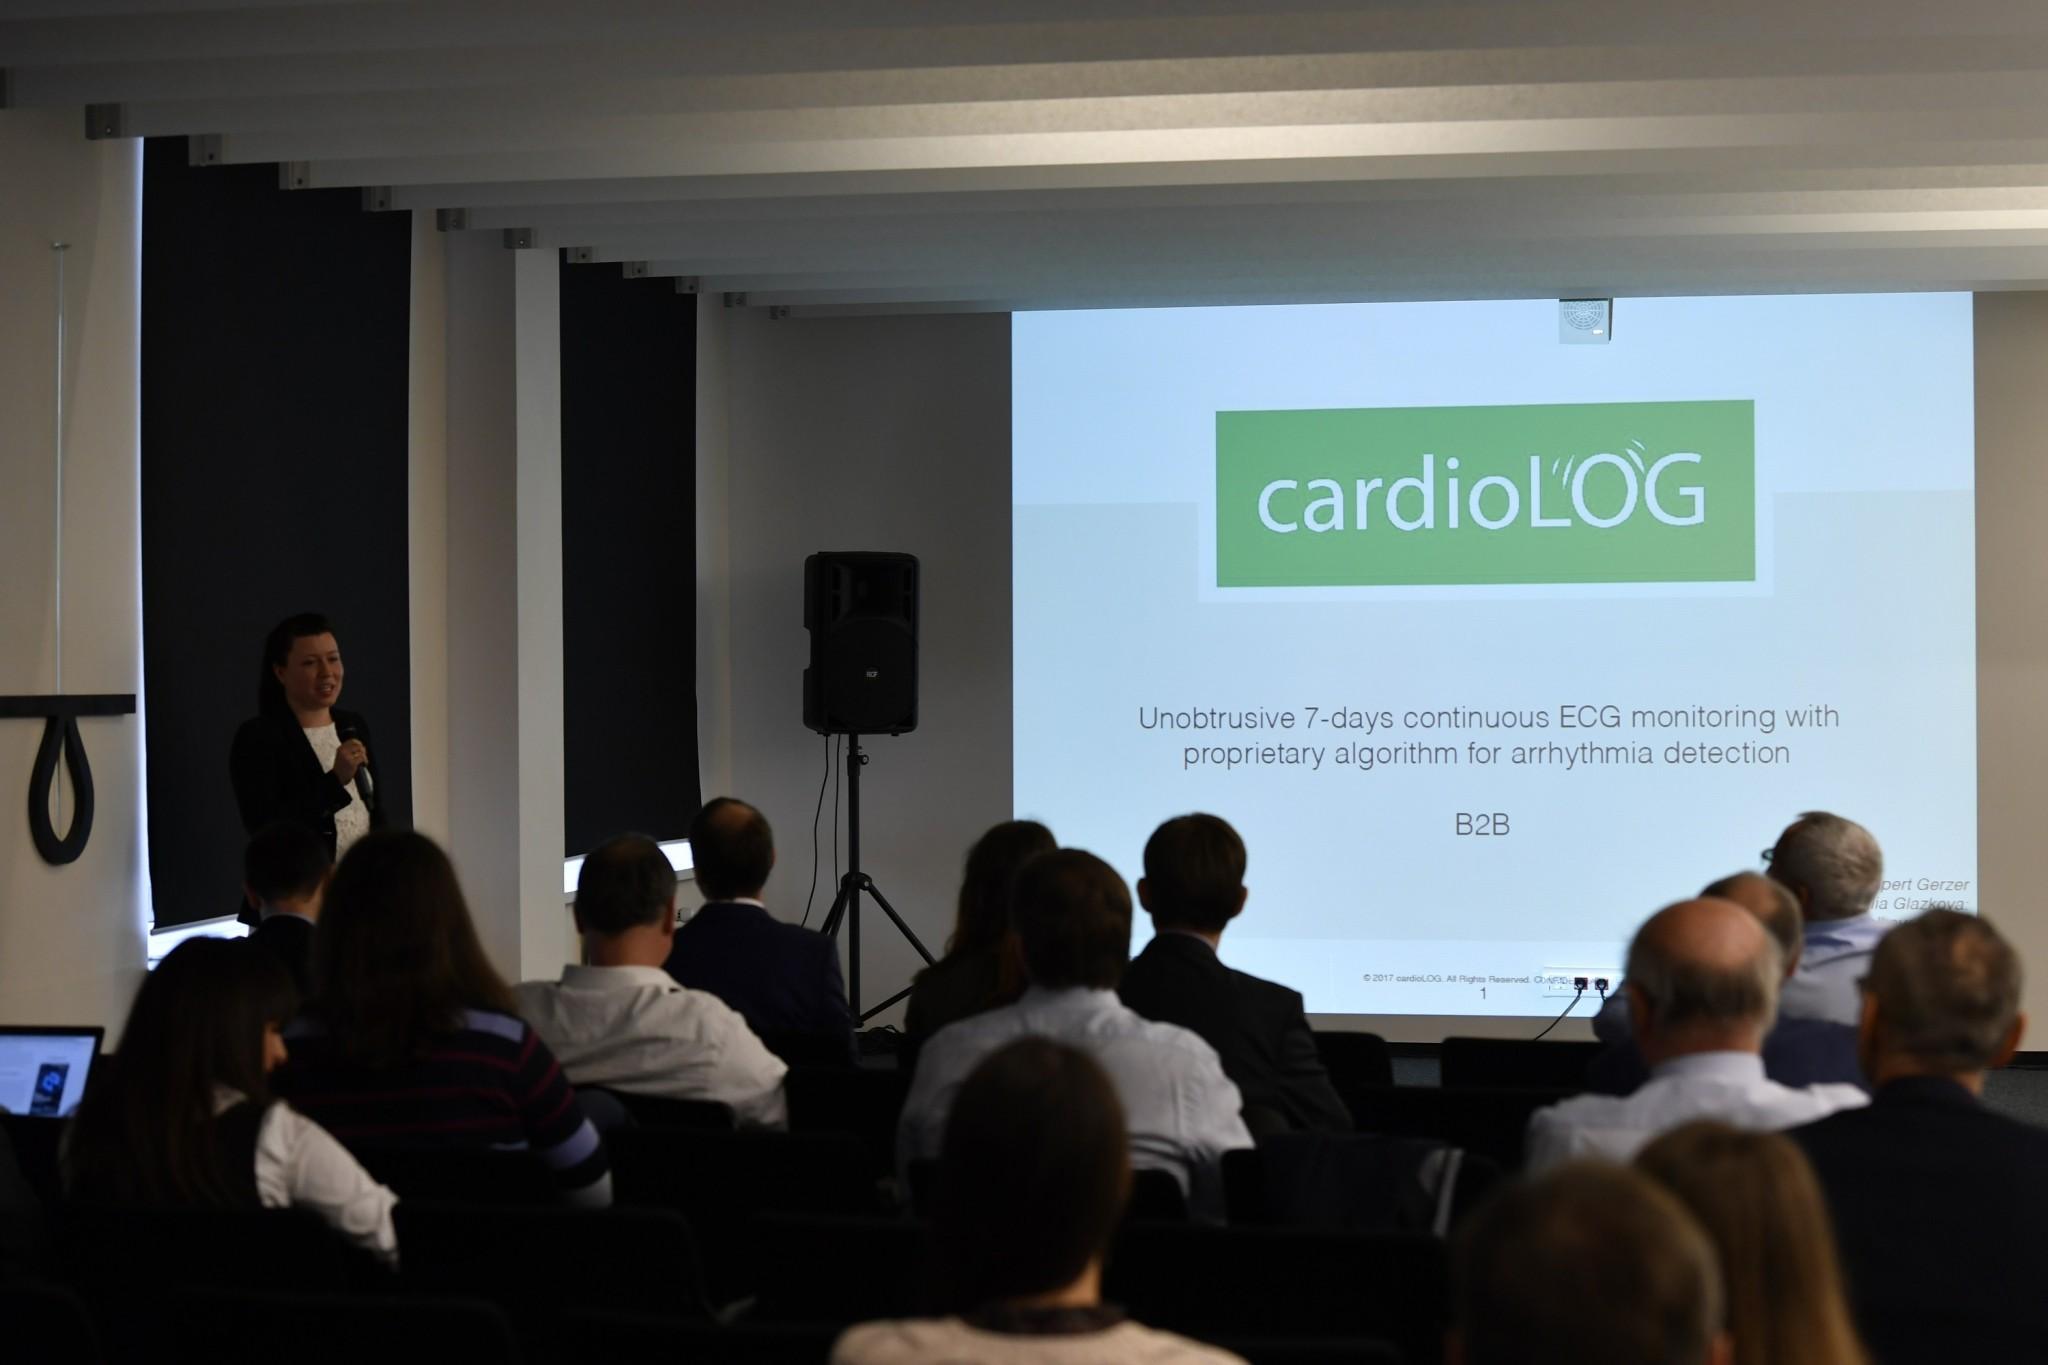 A team presents on a technology aimed at detecting irregular heartbeats. Photo: Skoltech.